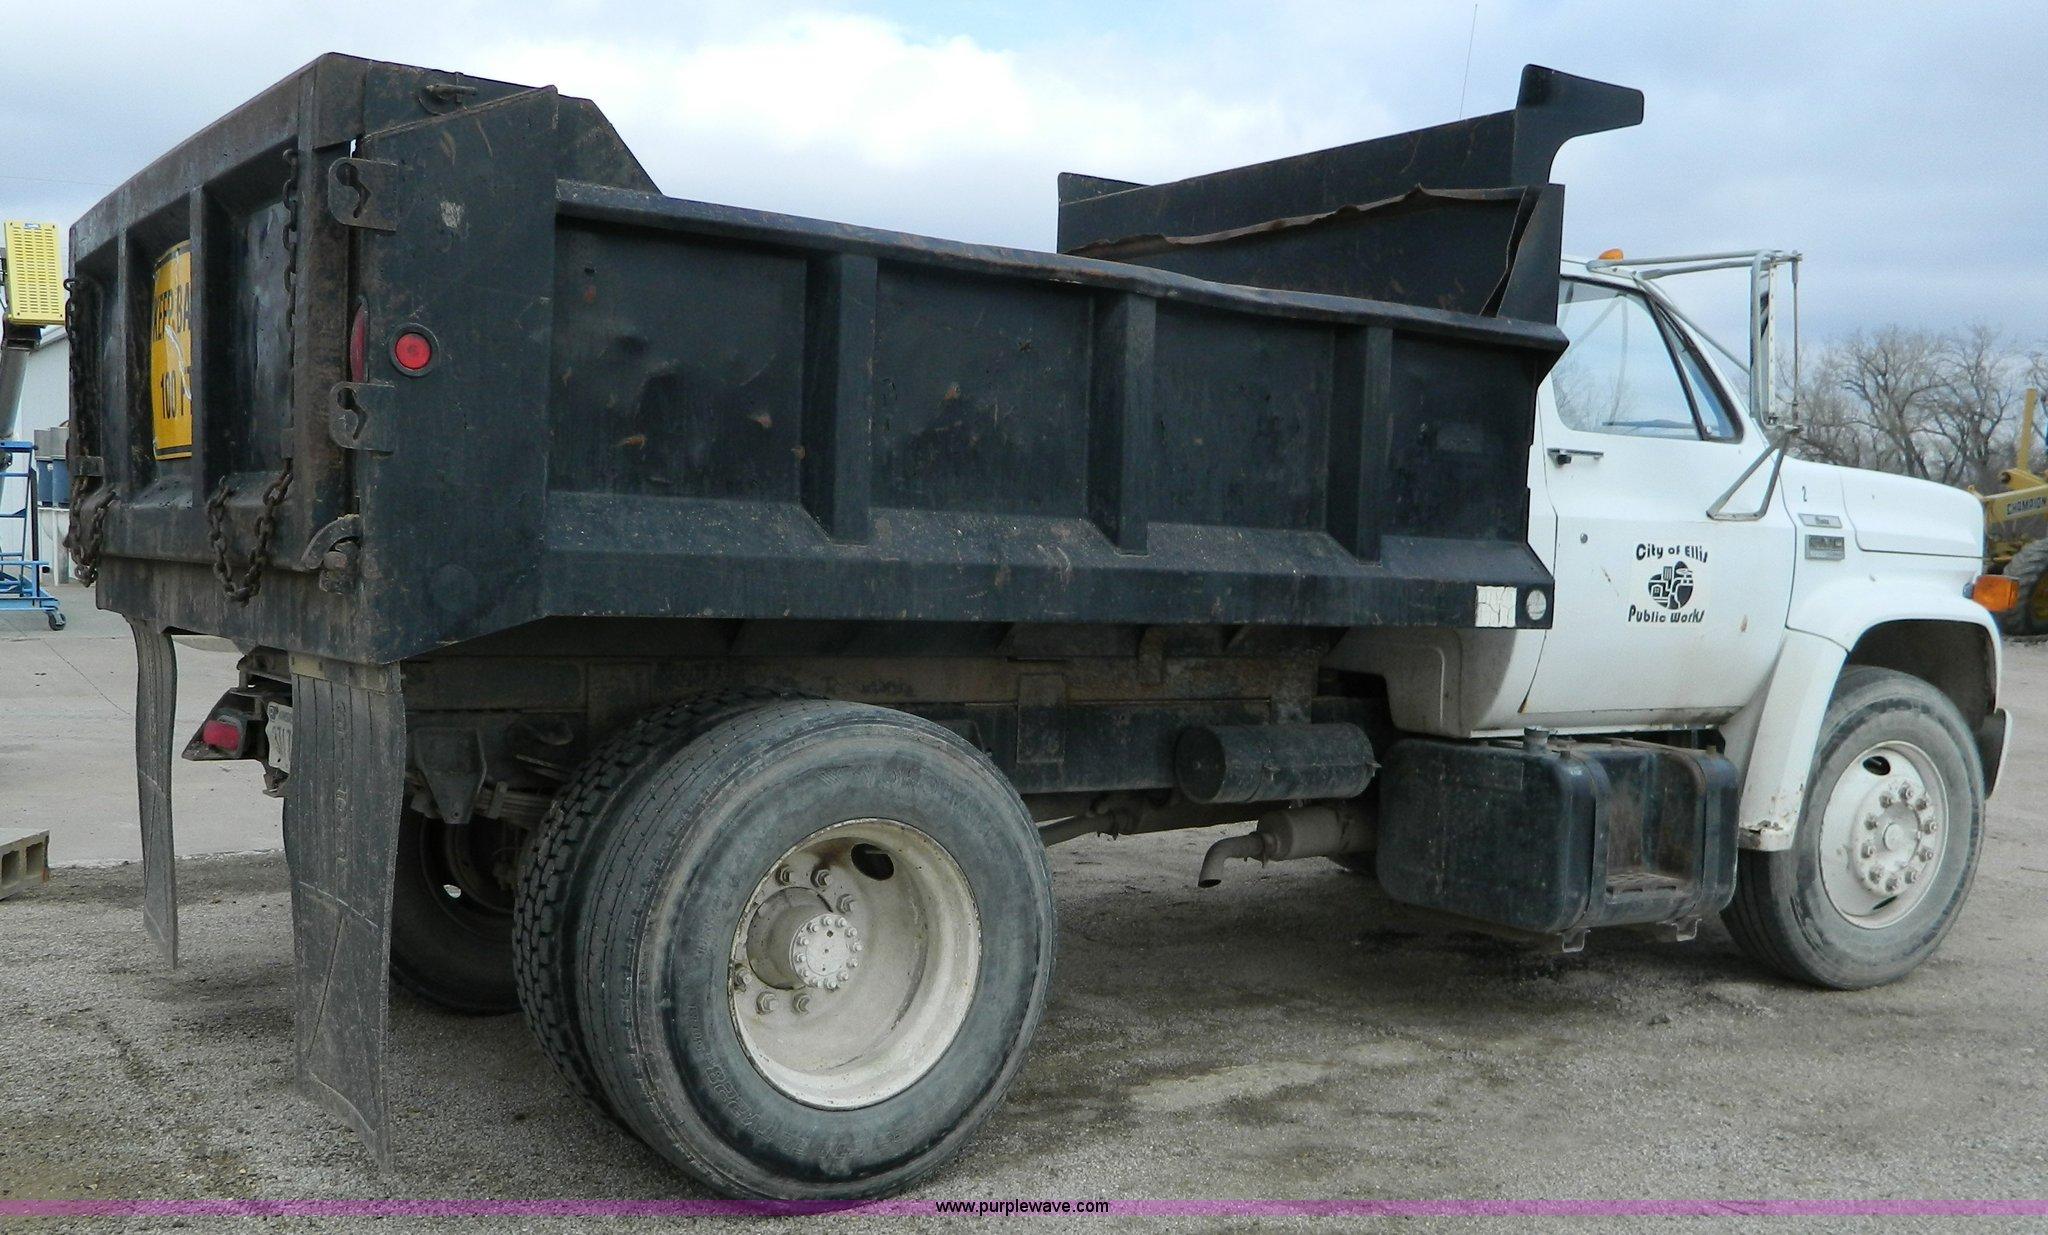 1978 Gmc 6500 Dump Truck In Ellis Ks Item L7305 Sold Purple Wave